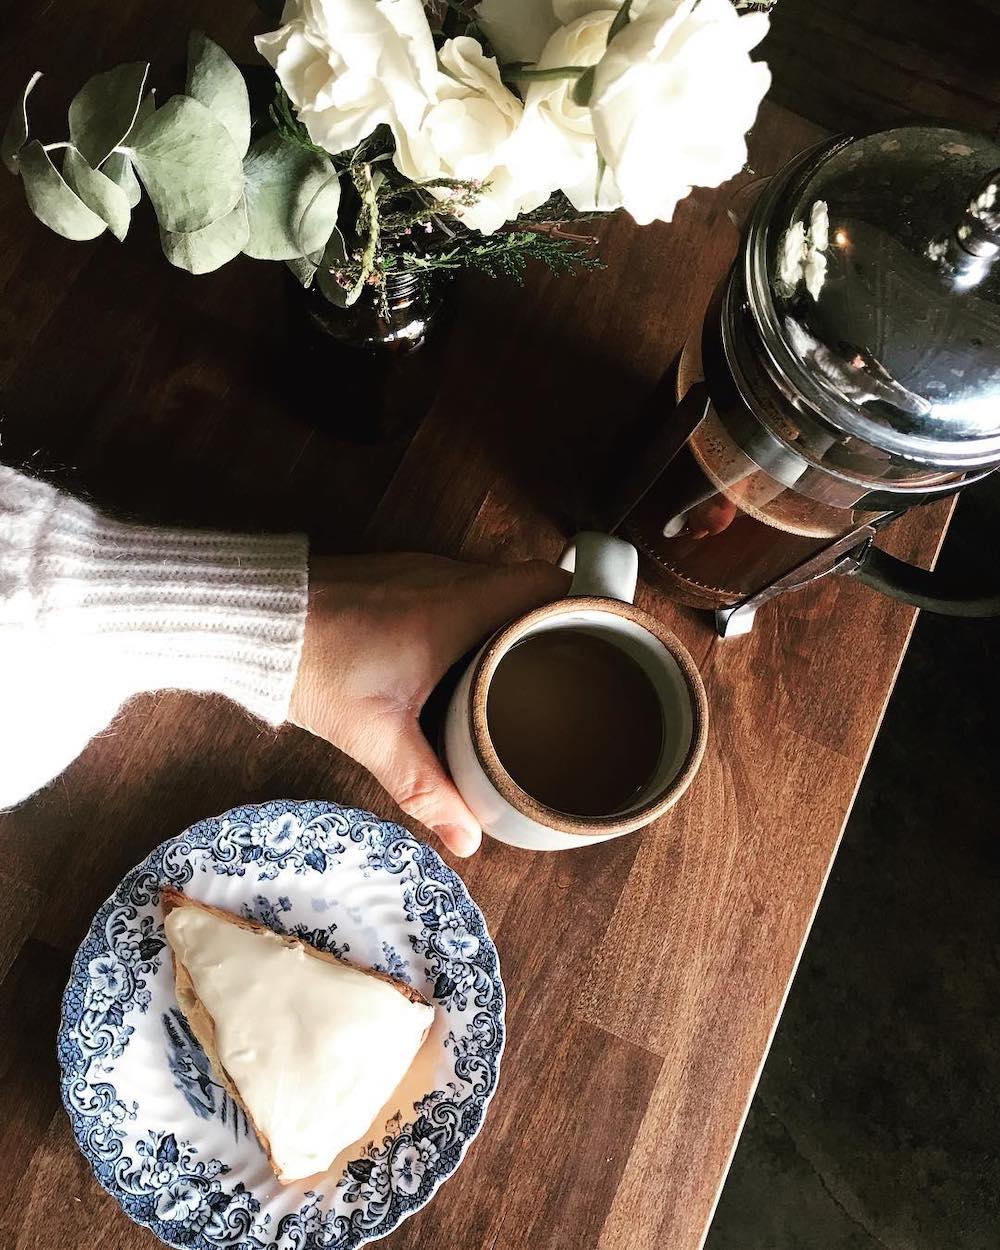 Photo Courtesy:  Wildwood Cafe Instagram